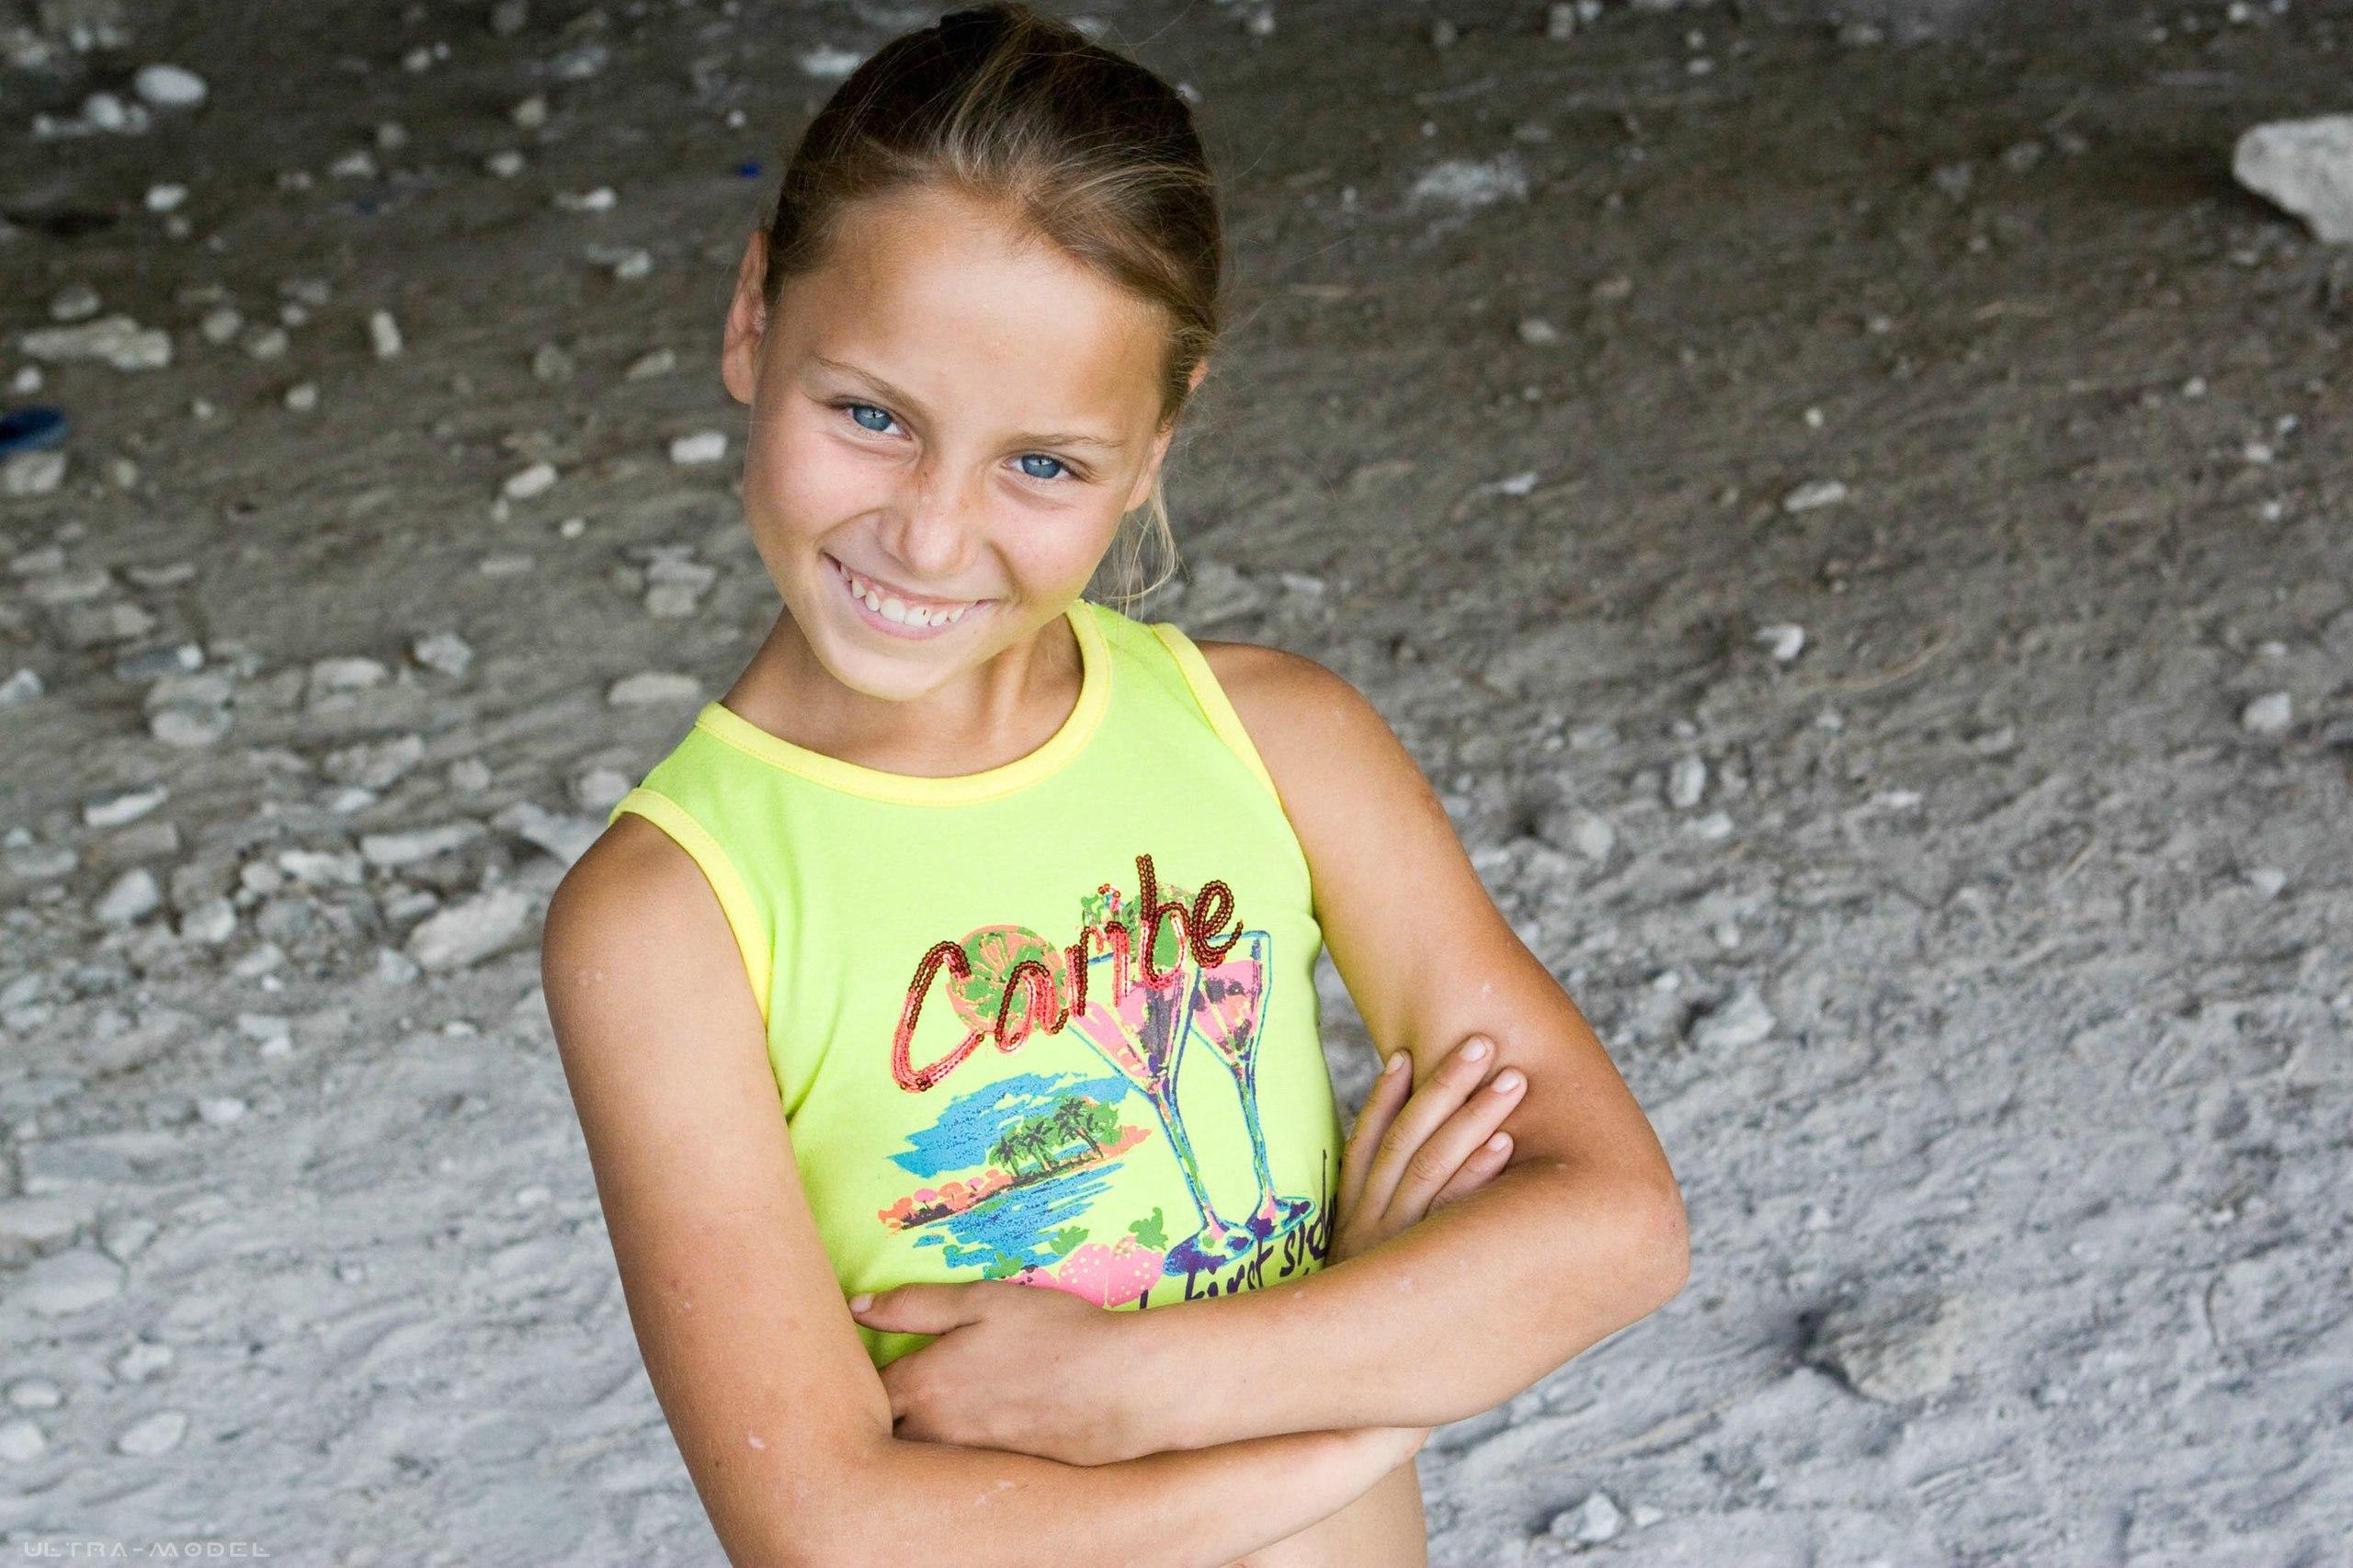 Previous page: kendall jenner model bikini.